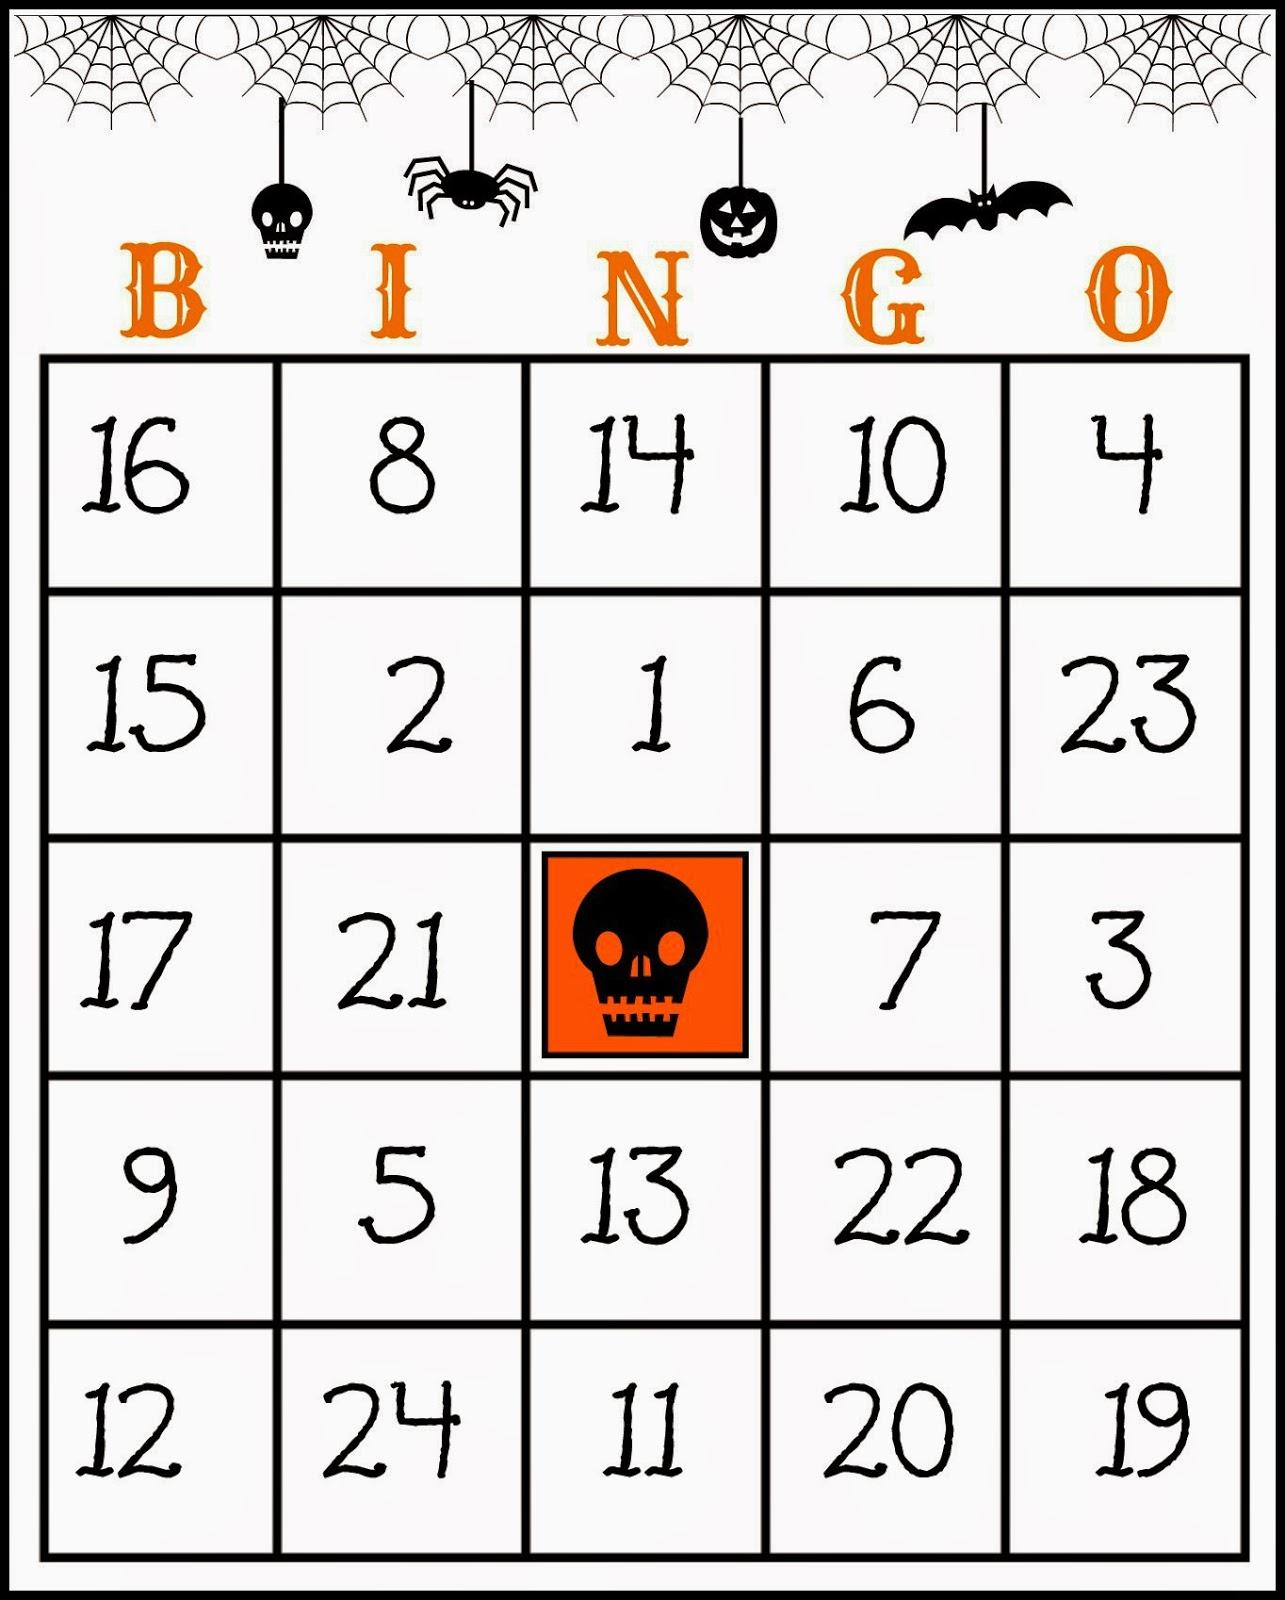 free printable bingo cards 1-75 pdf